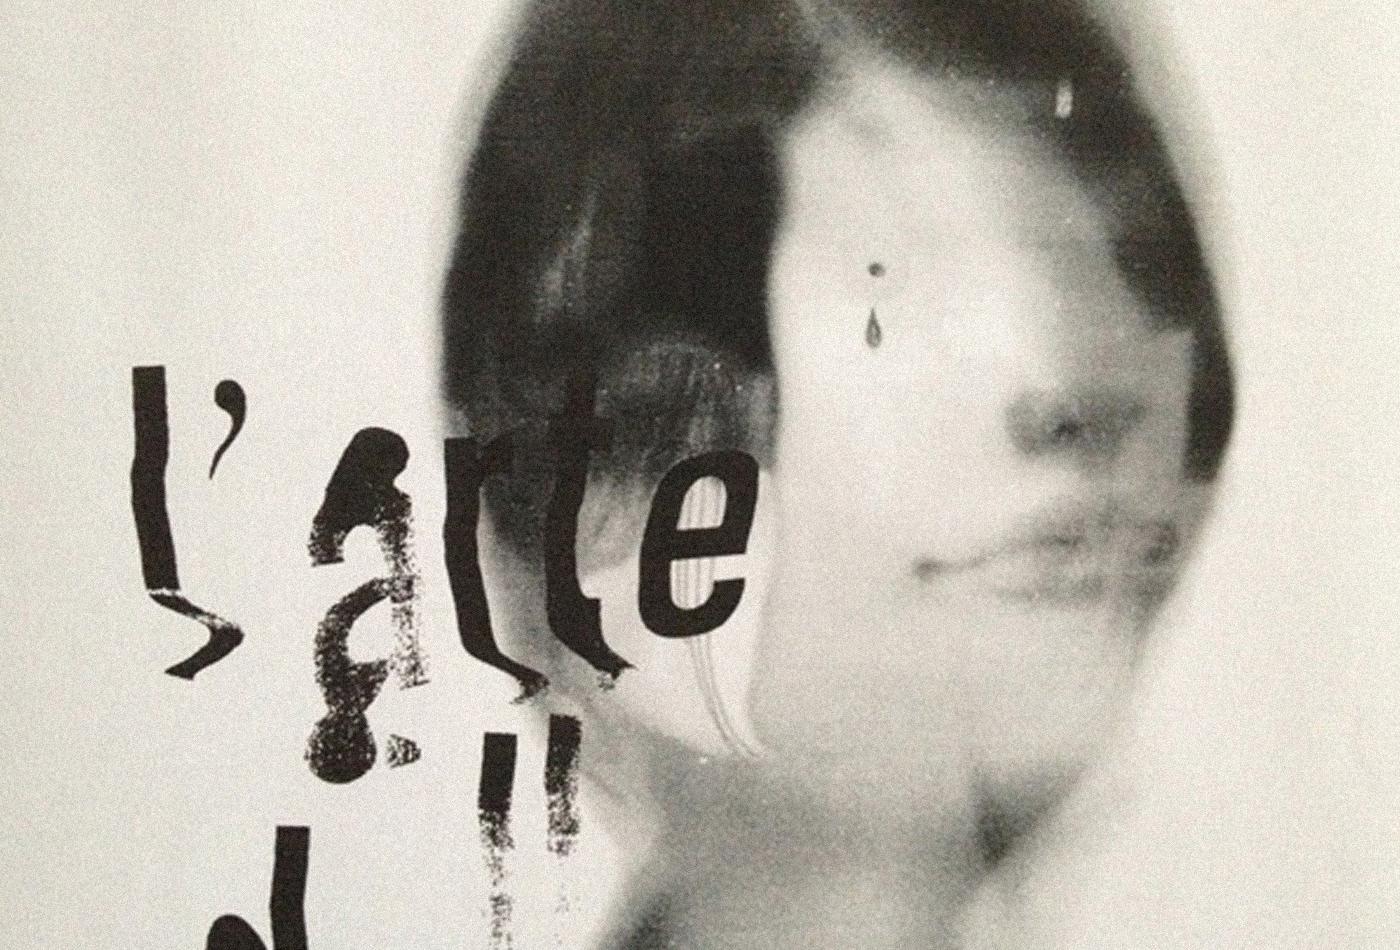 01-theatre-poster-manifesto-illustration-vacaliebres